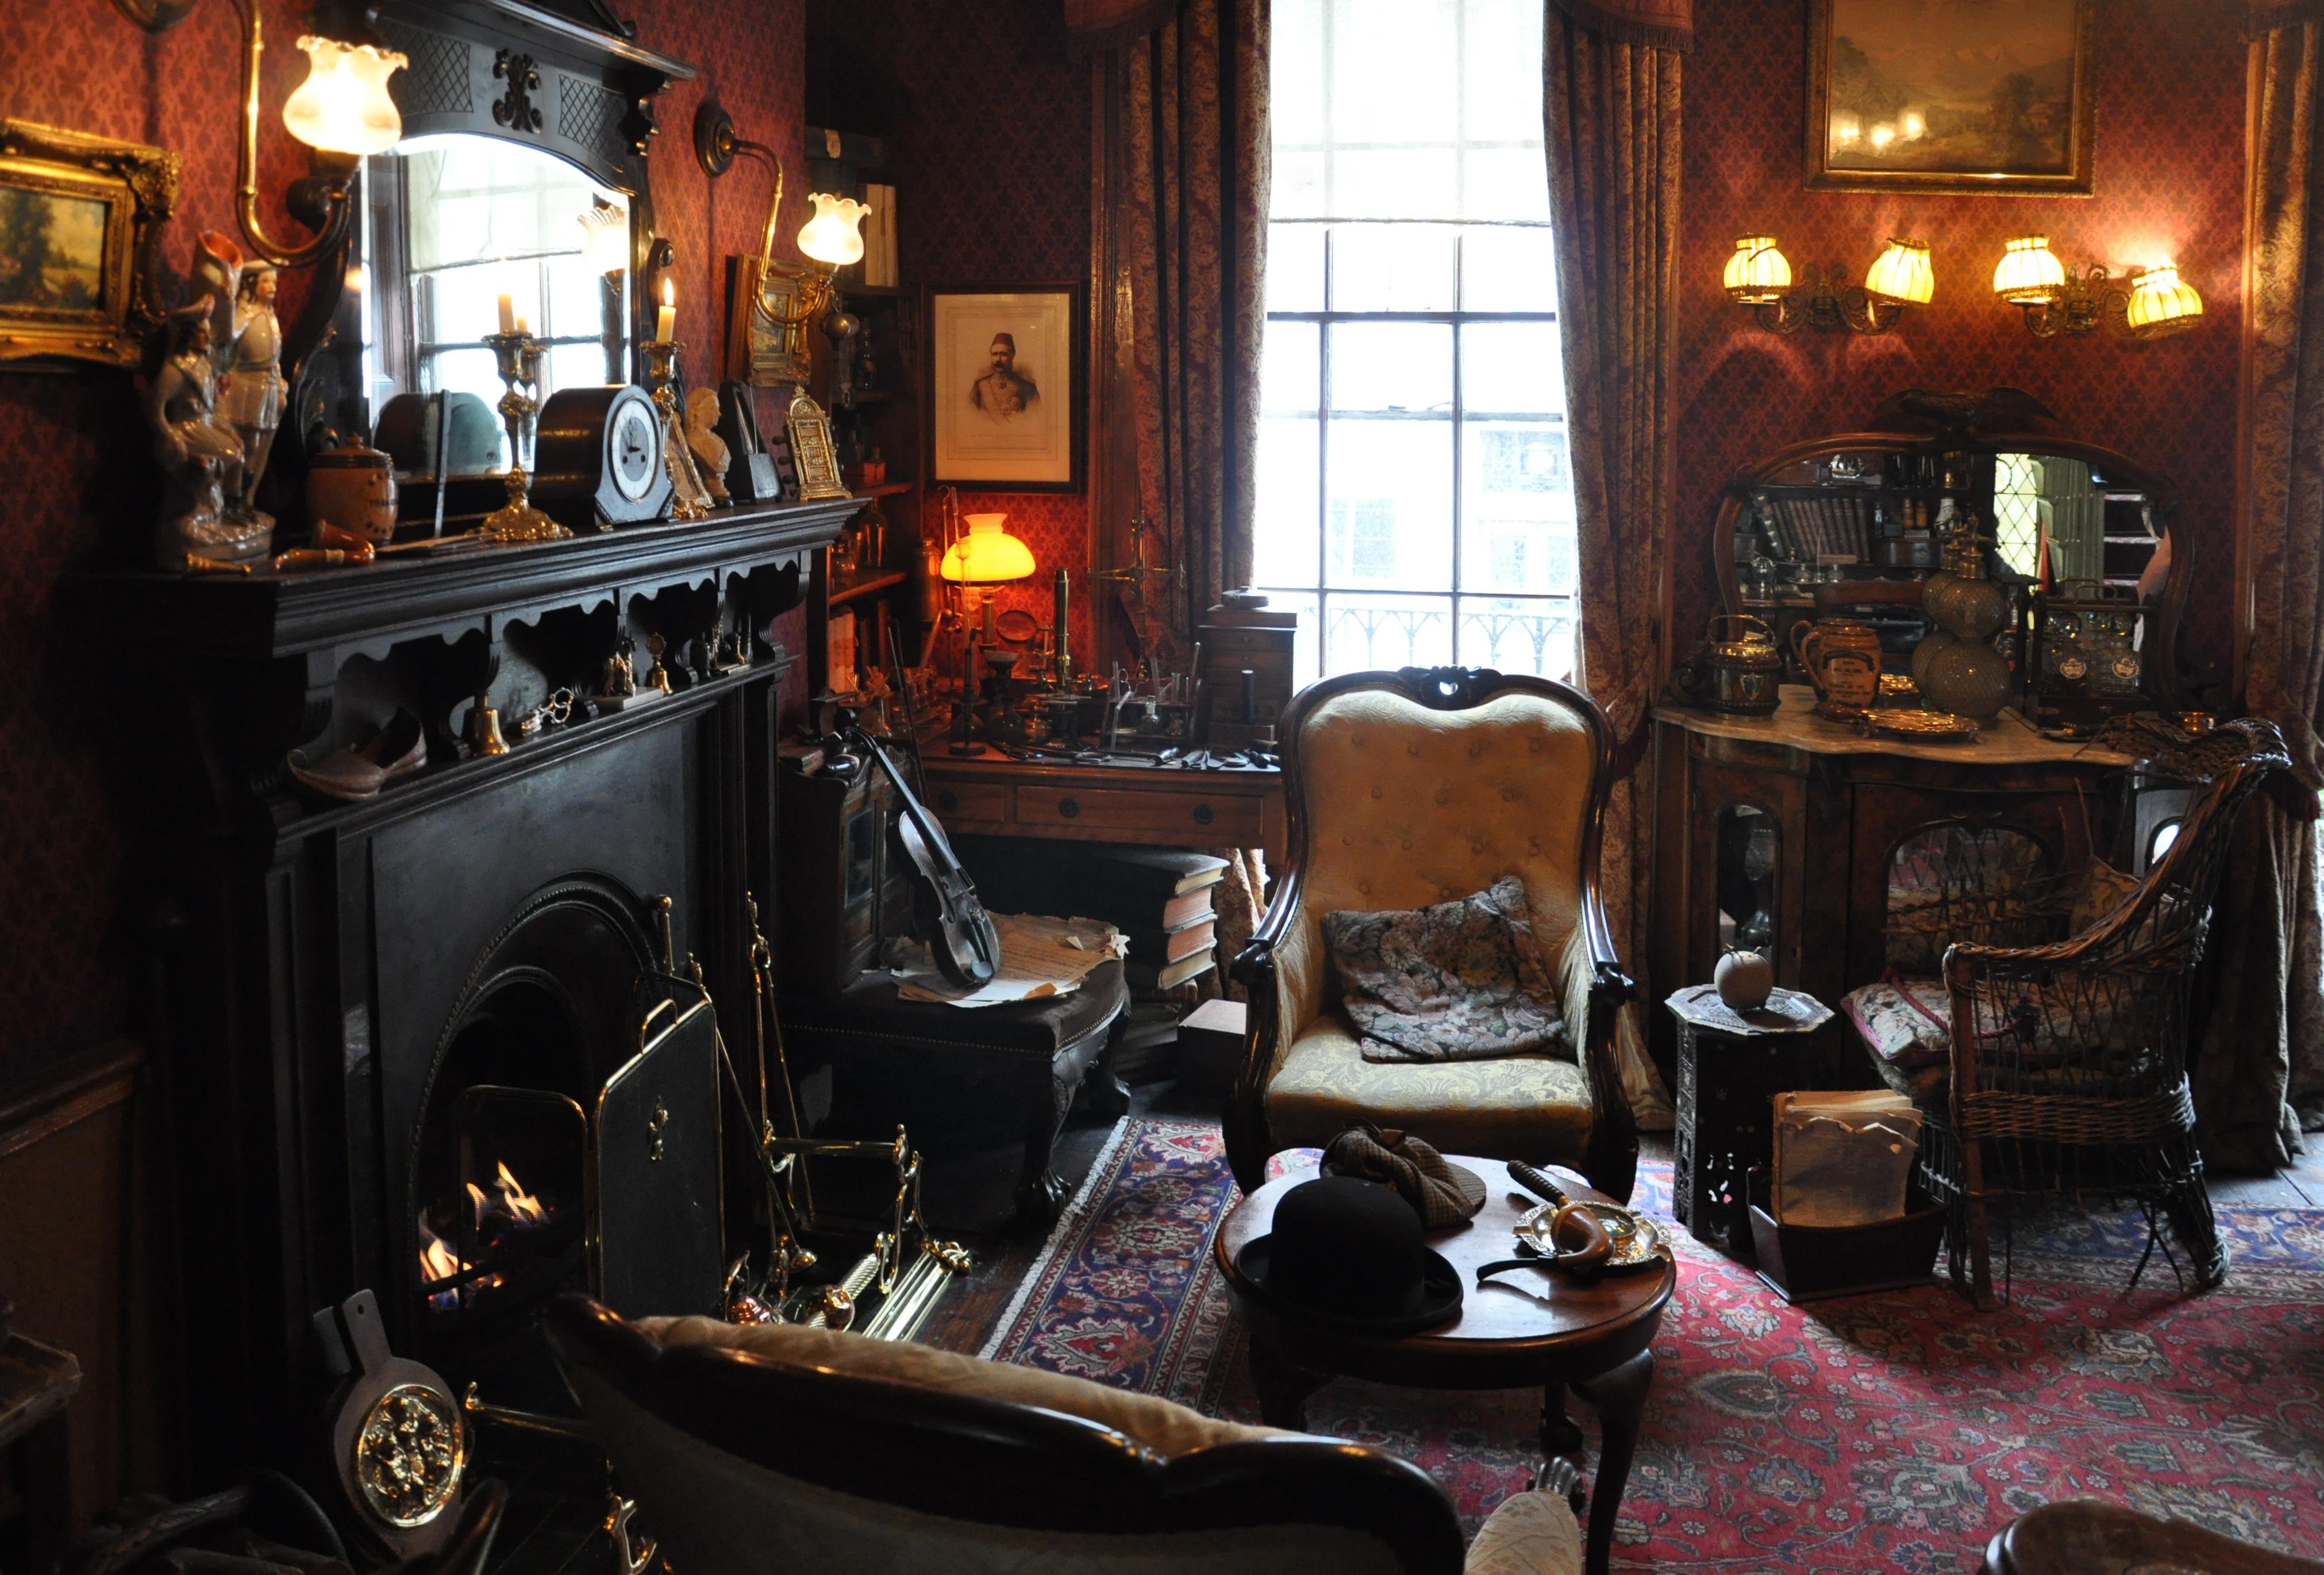 https://i2.wp.com/upload.wikimedia.org/wikipedia/commons/3/38/Sherlock_Holmes_Museum_001.jpg